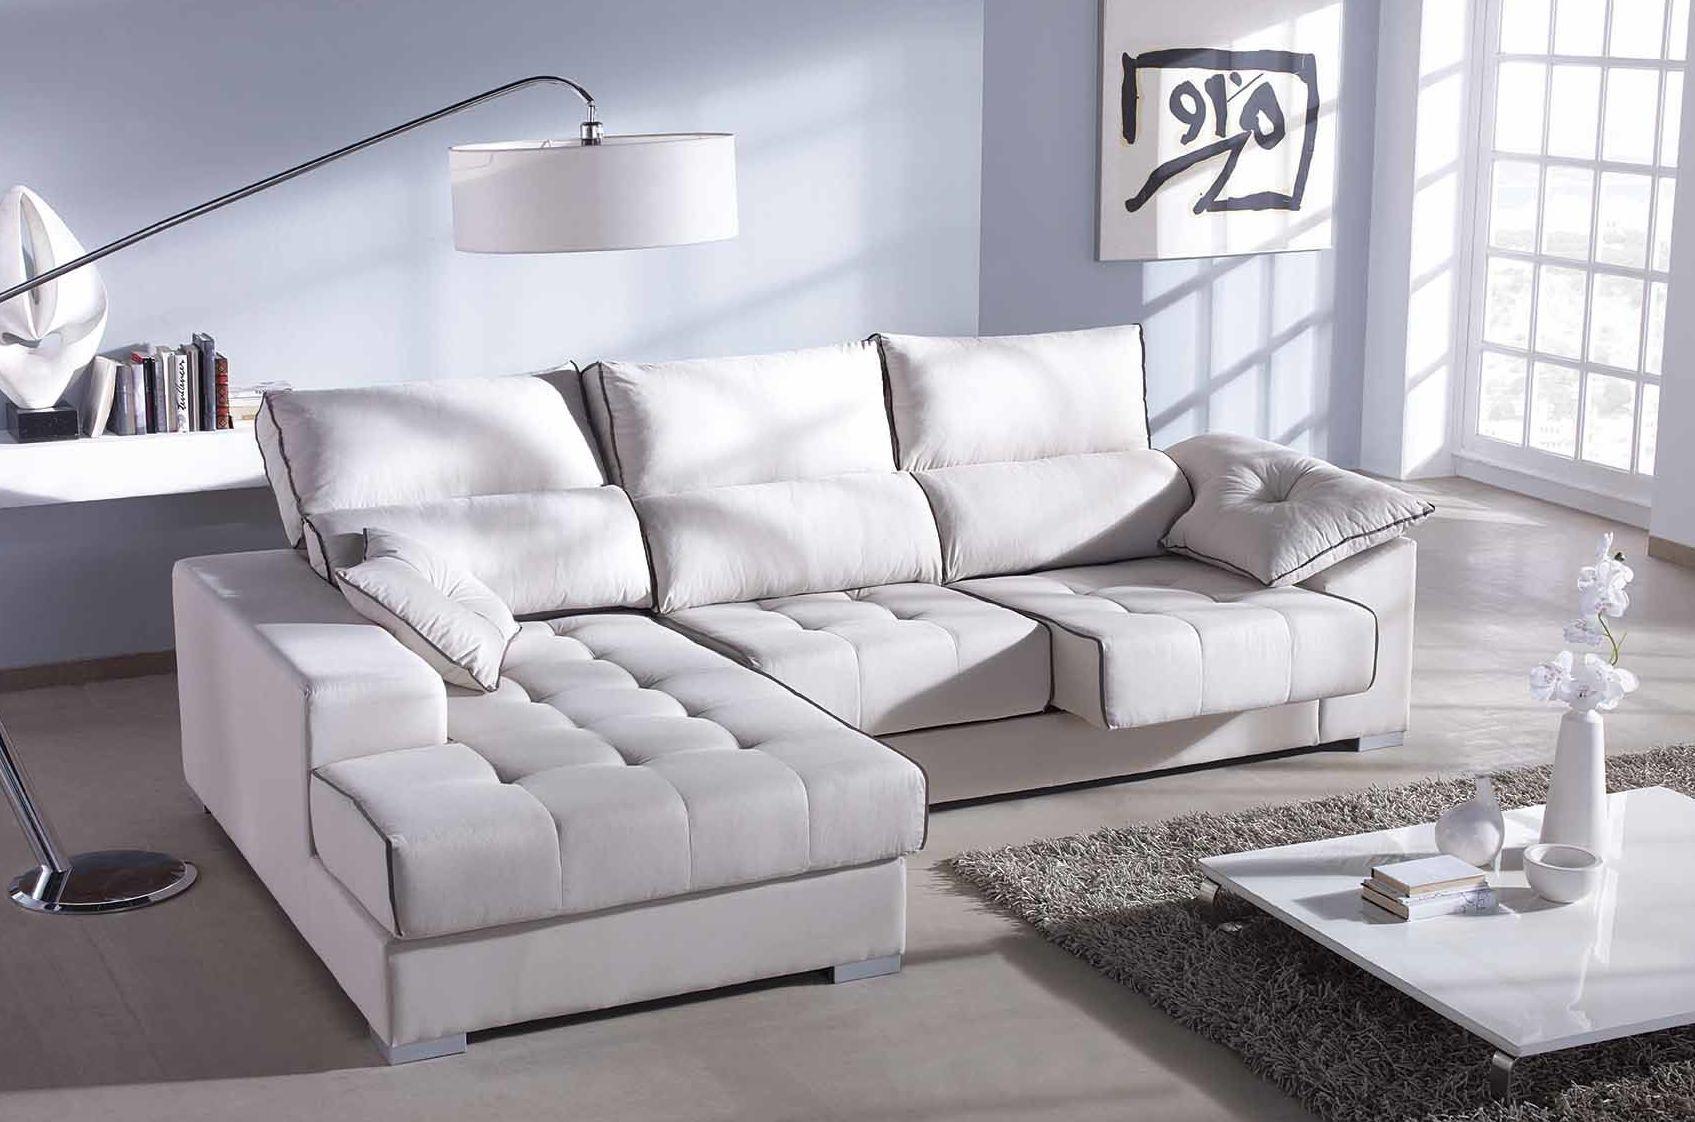 sofas baratos valencia sofas baratos alberic sofas baratos torrent sofas baratos burjassot